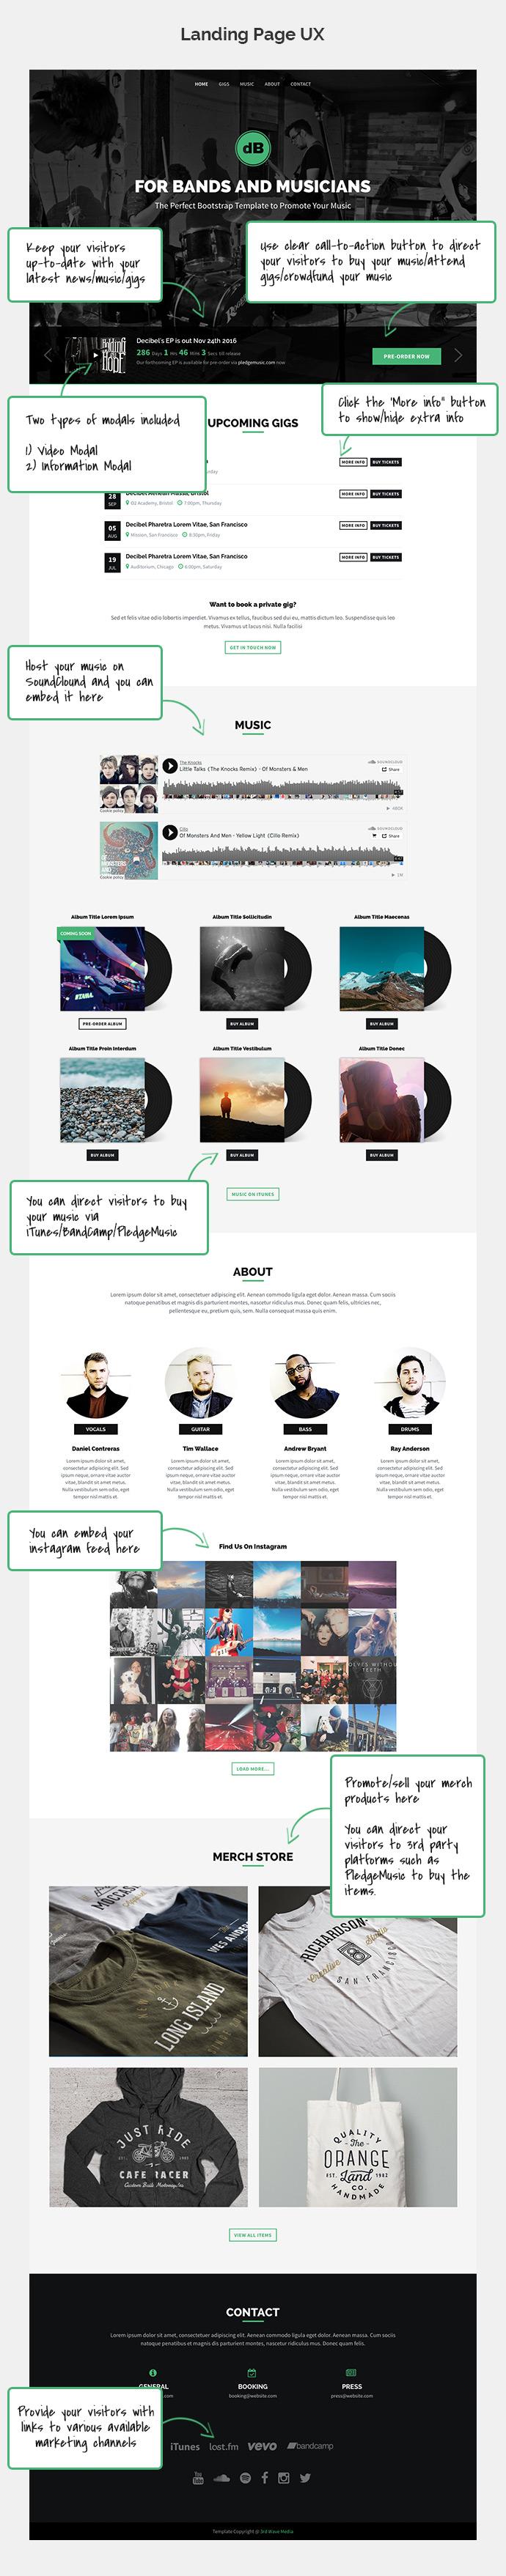 decibel-promo-with-ux-notes